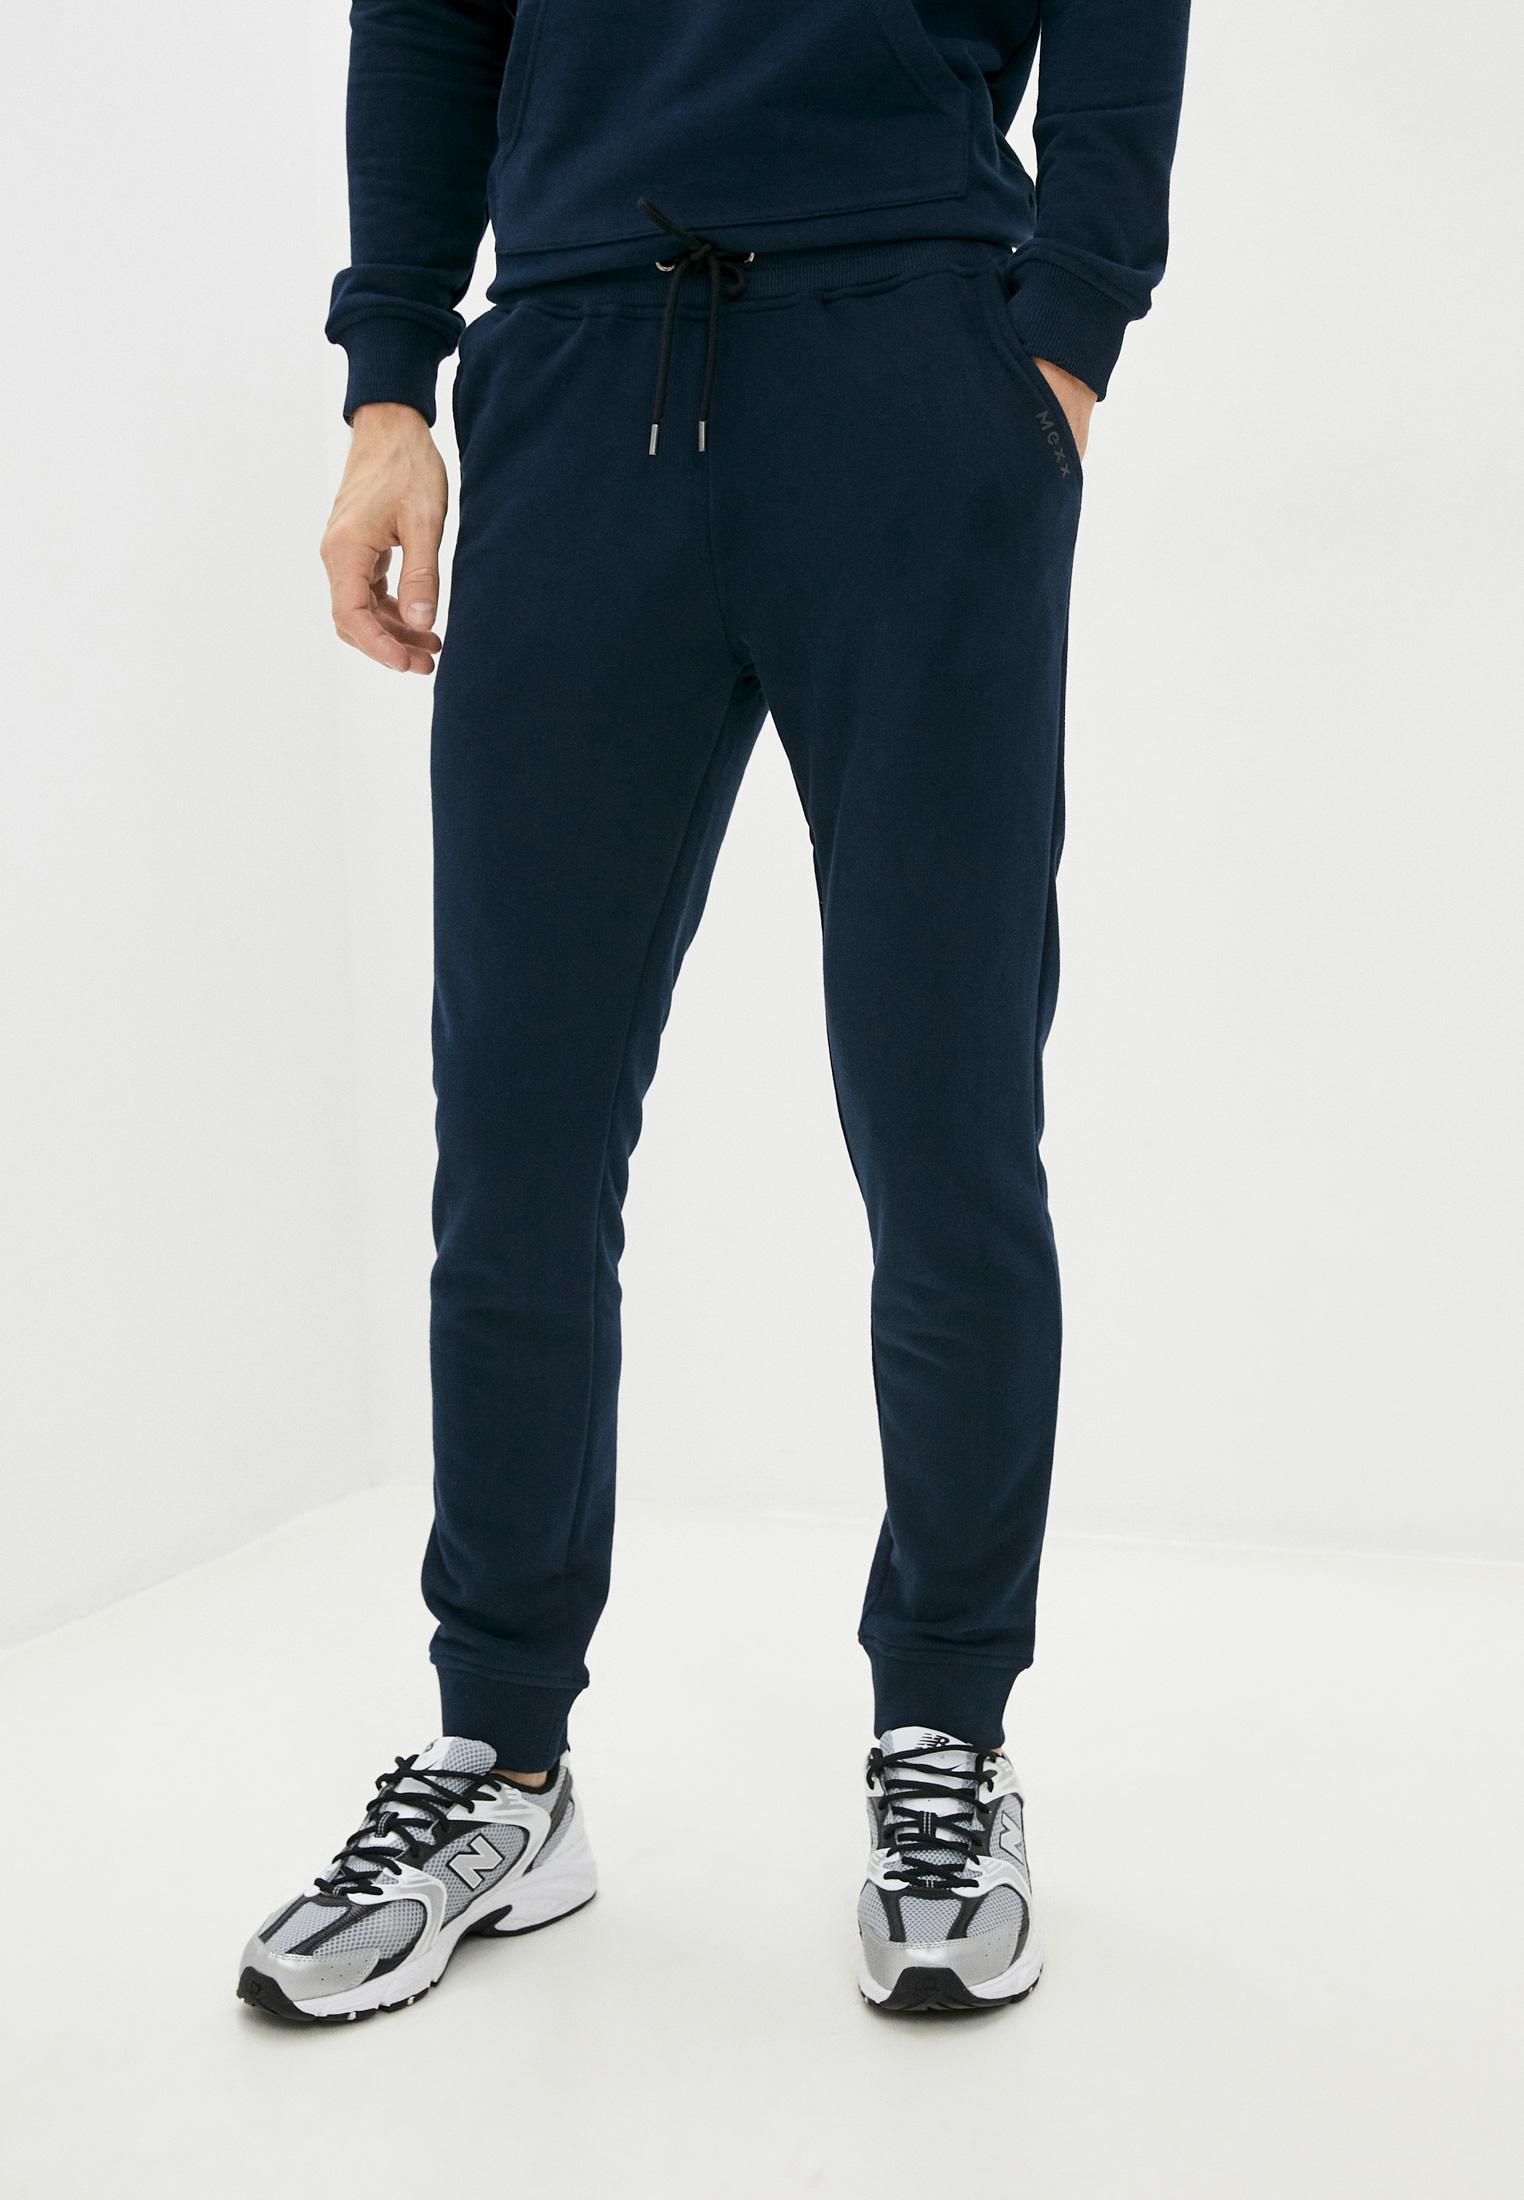 Мужские спортивные брюки Mexx (Мекс) MO1320013M